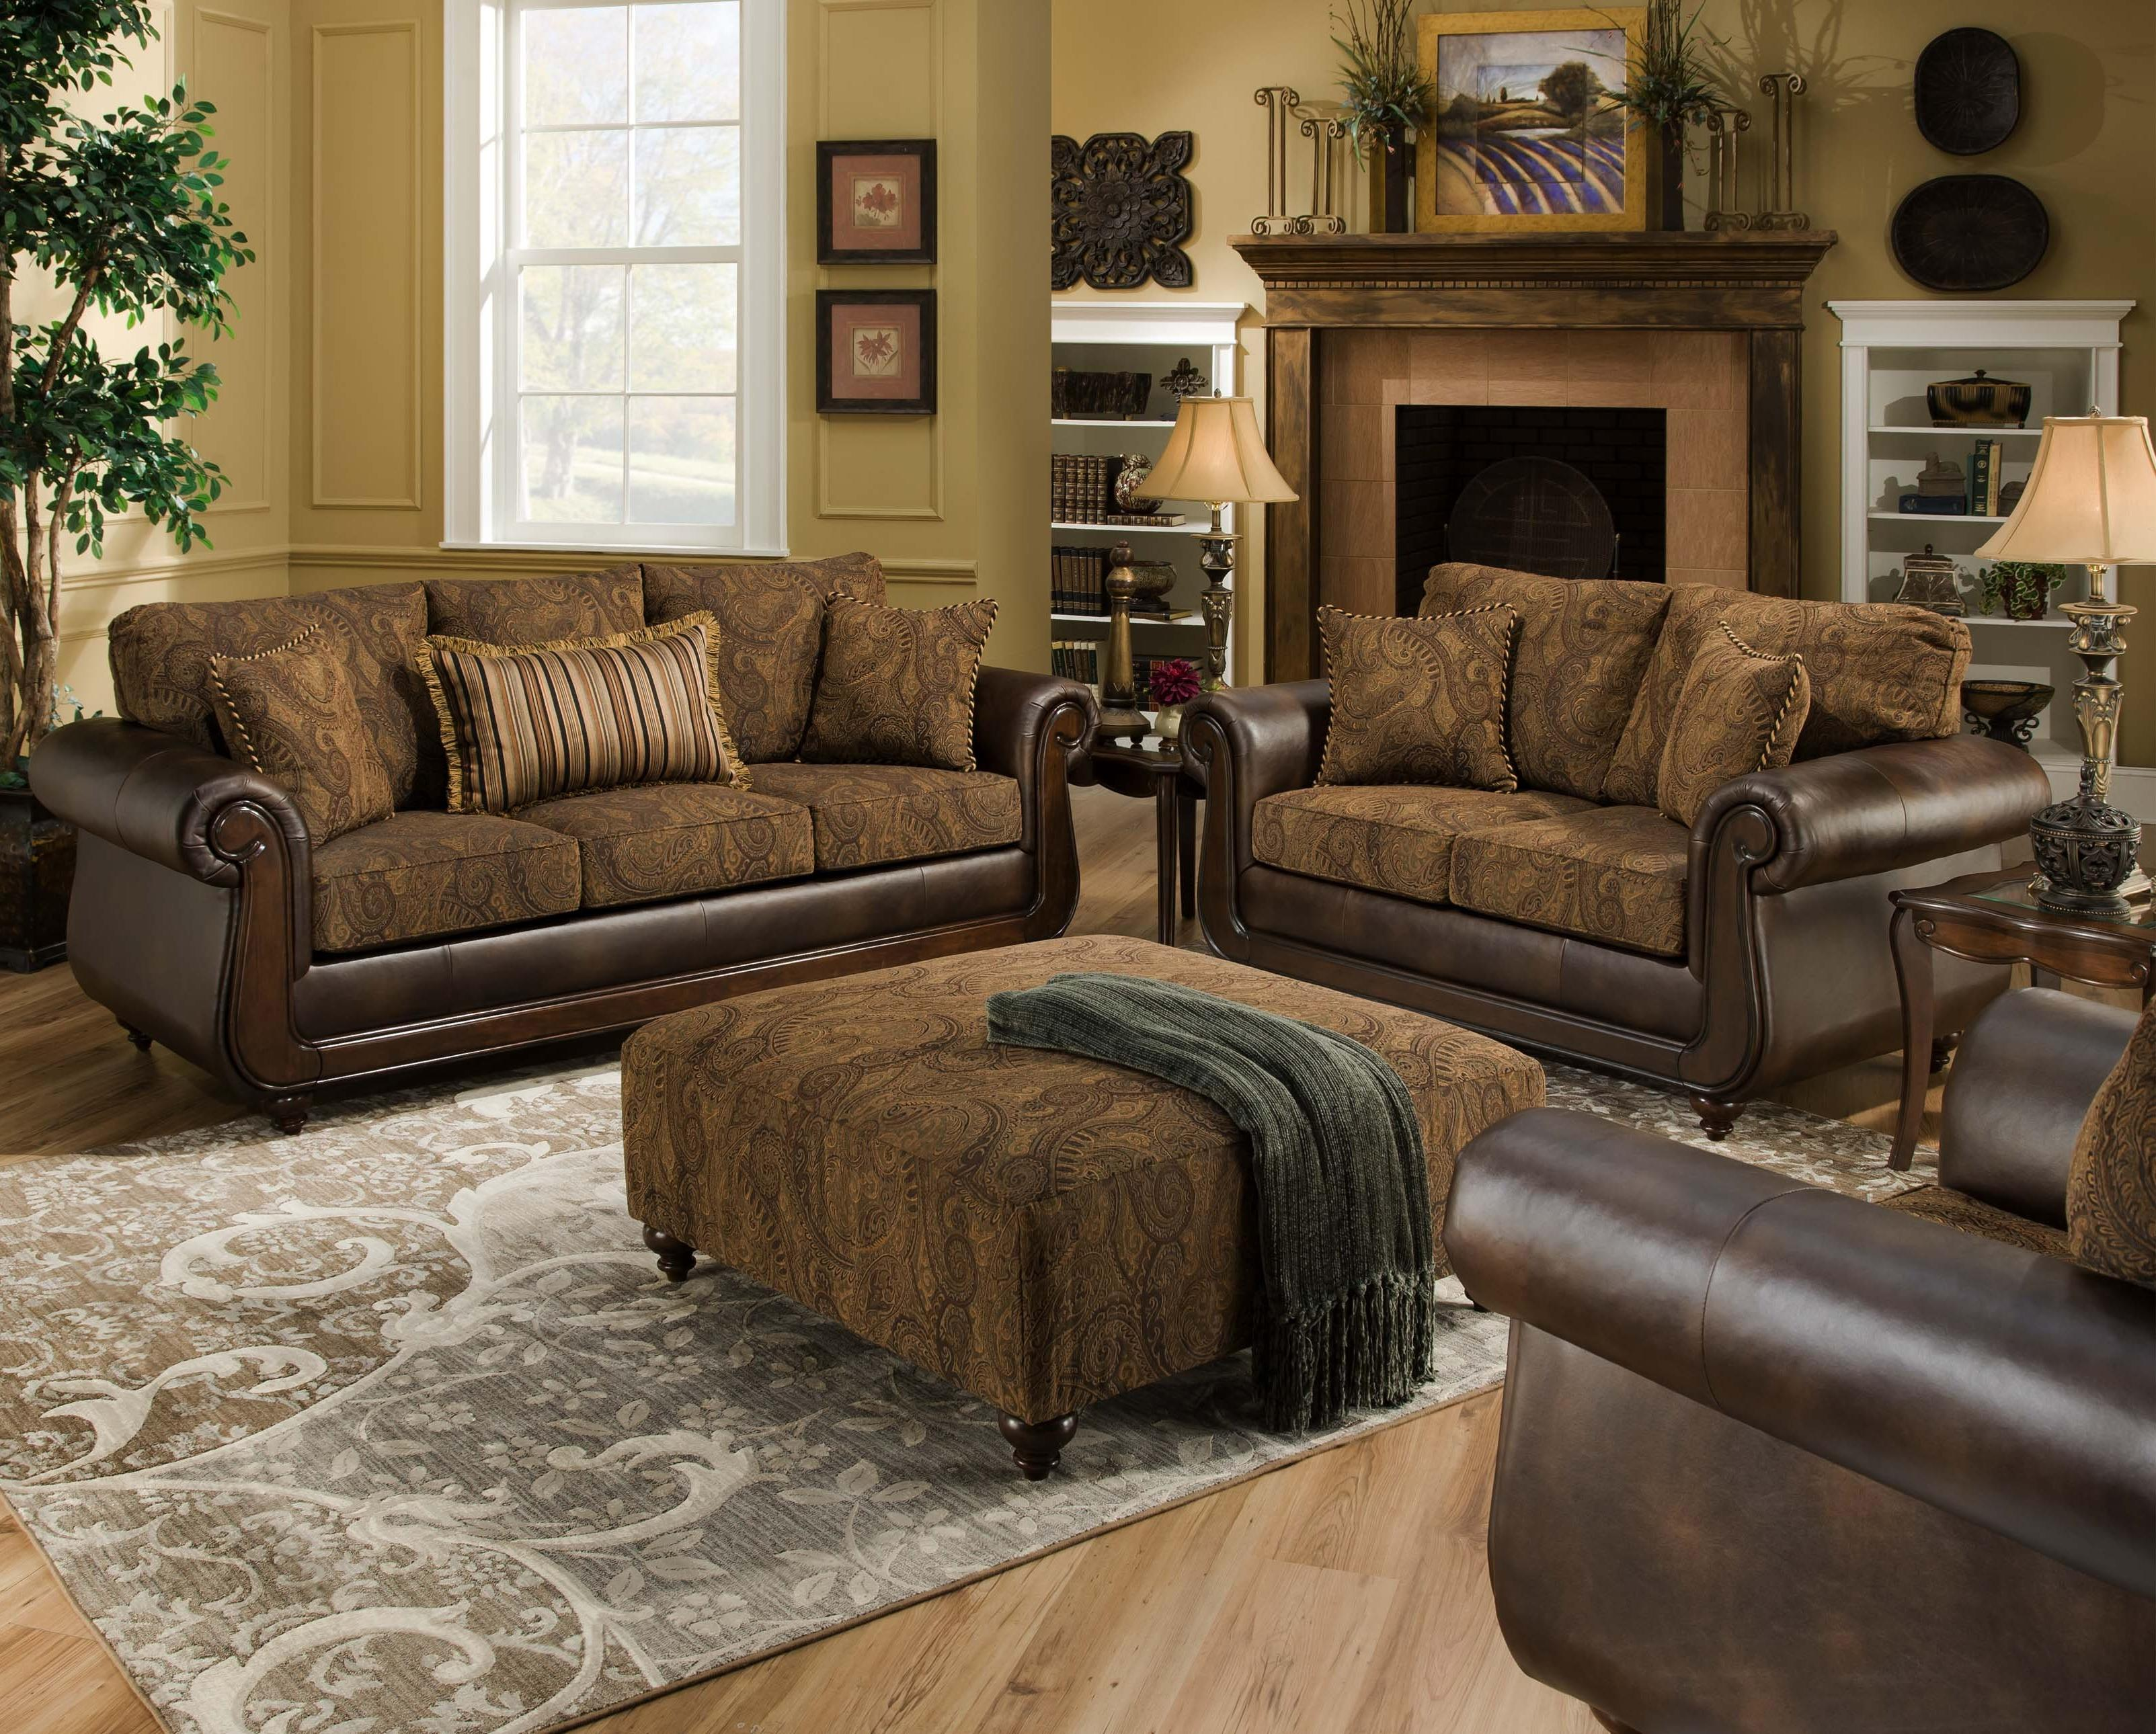 https://images.furnituredealer.net/img/collections%2Famerican_furniture%2F5850%20-%20isle%20tobacco%20-%20-1950851770_5850%20isle%20tobacco-bcb-b1.jpg